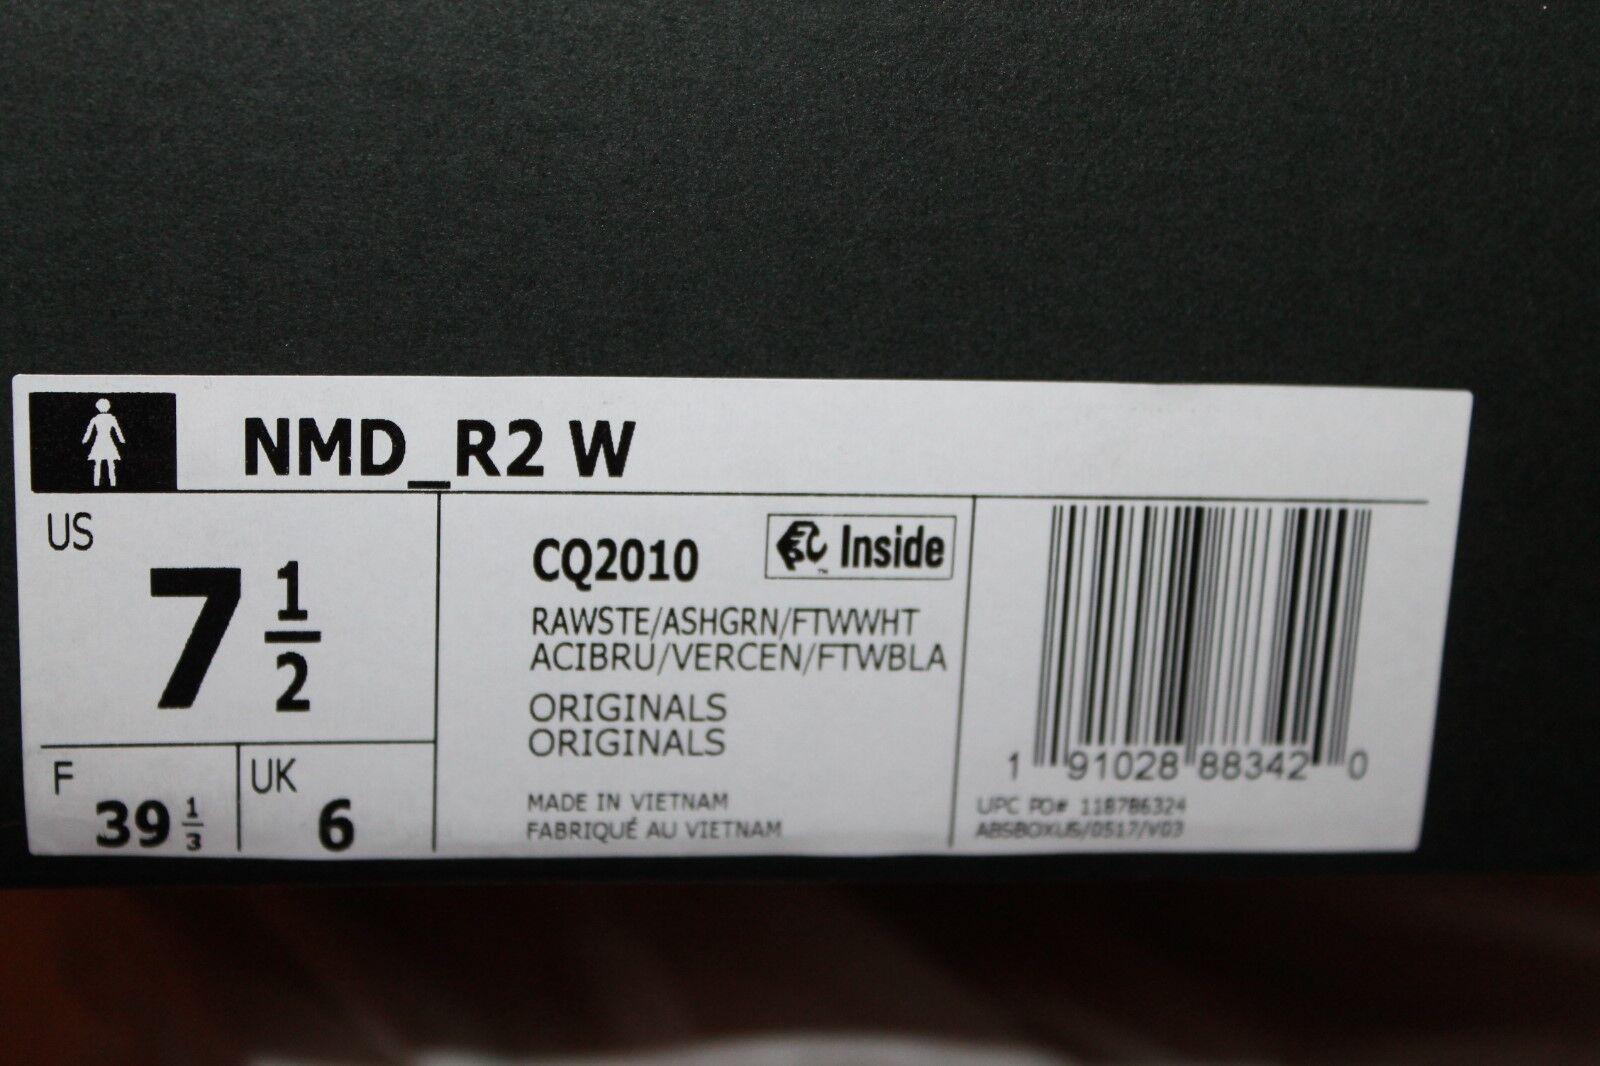 ADIDAS Originals NMD_R2    Raw Steel  Ash Green White CQ2010 Women's Tennis shoes 41ce42